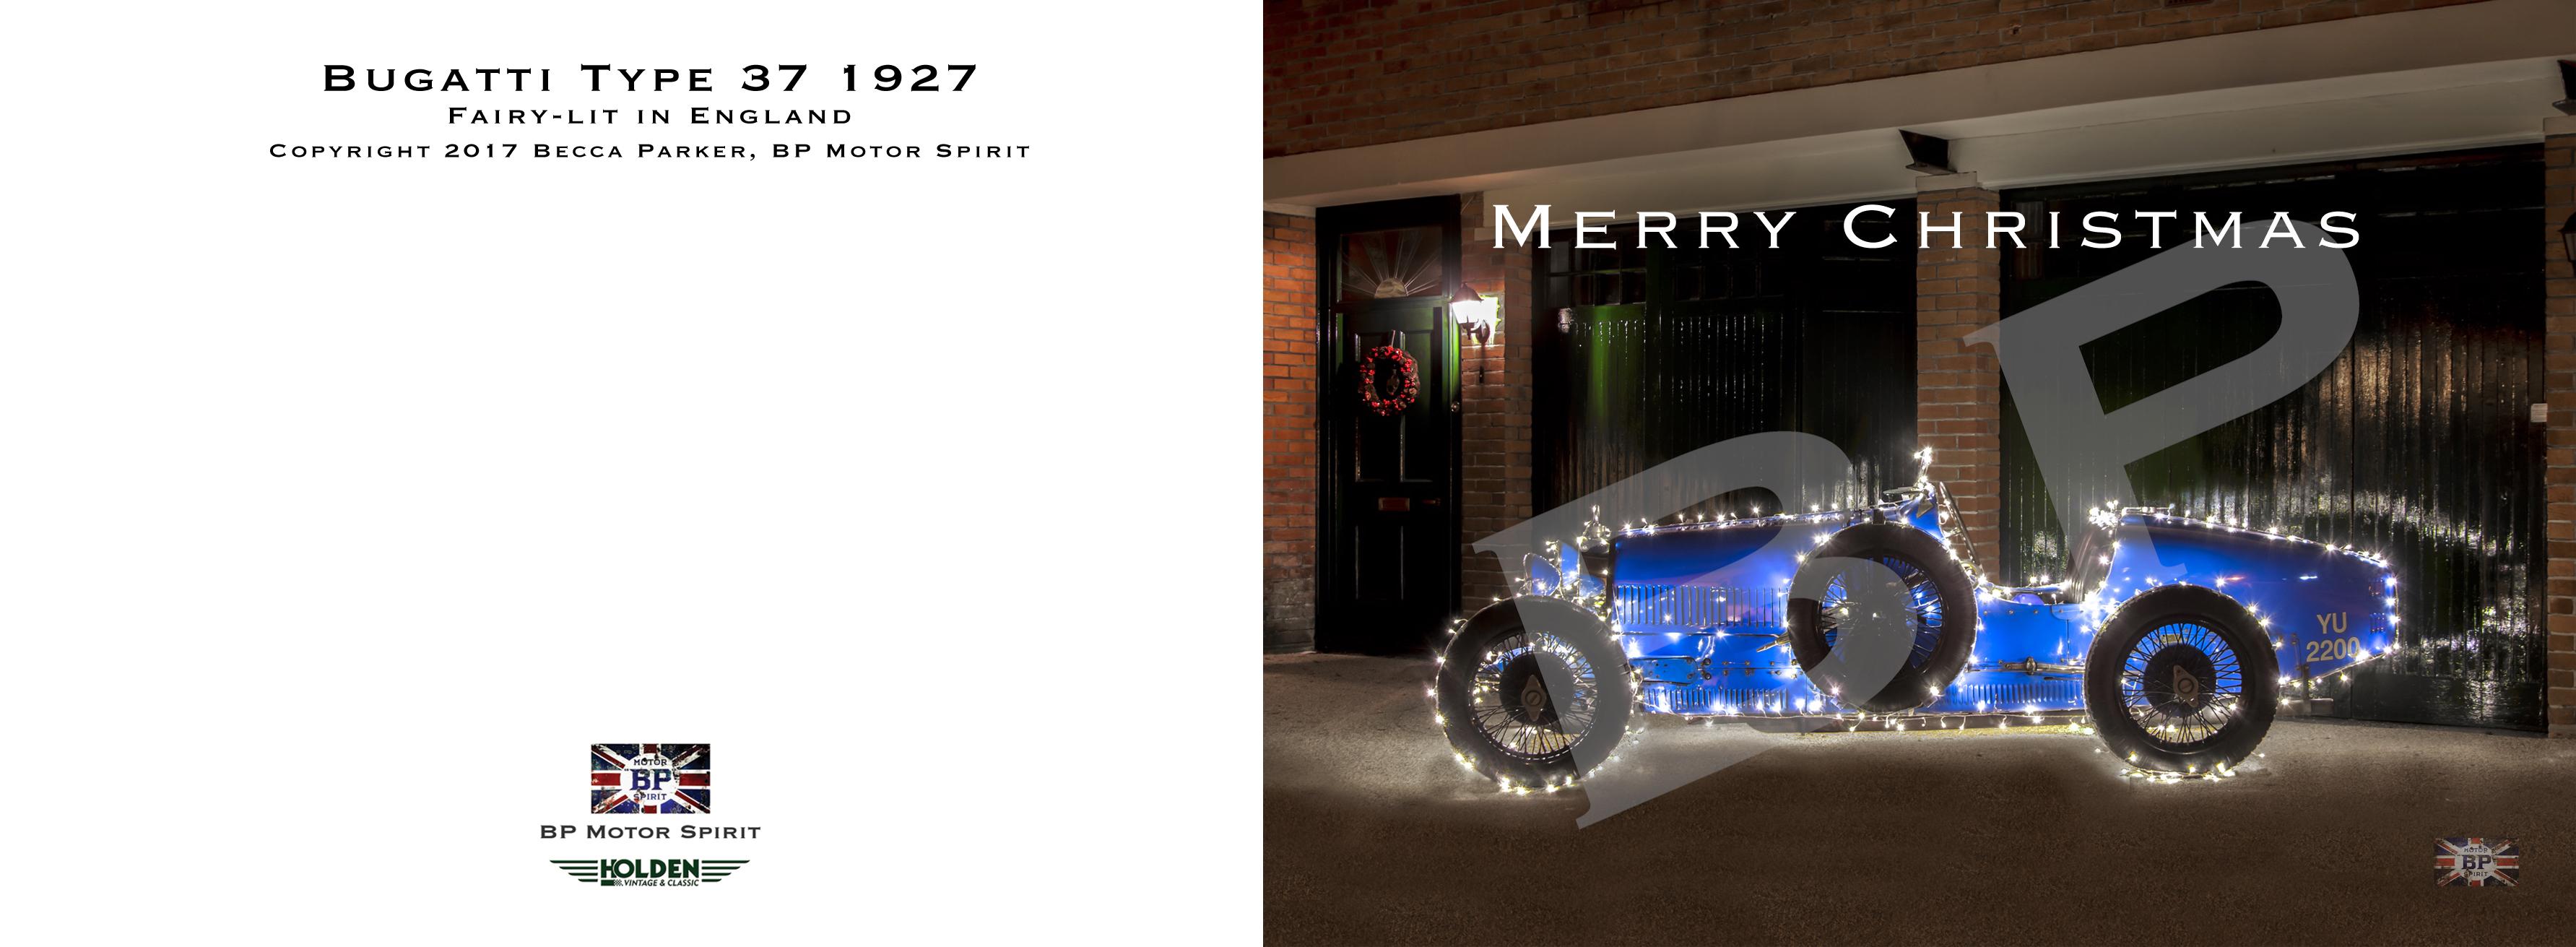 Bugatti Type 37 1927